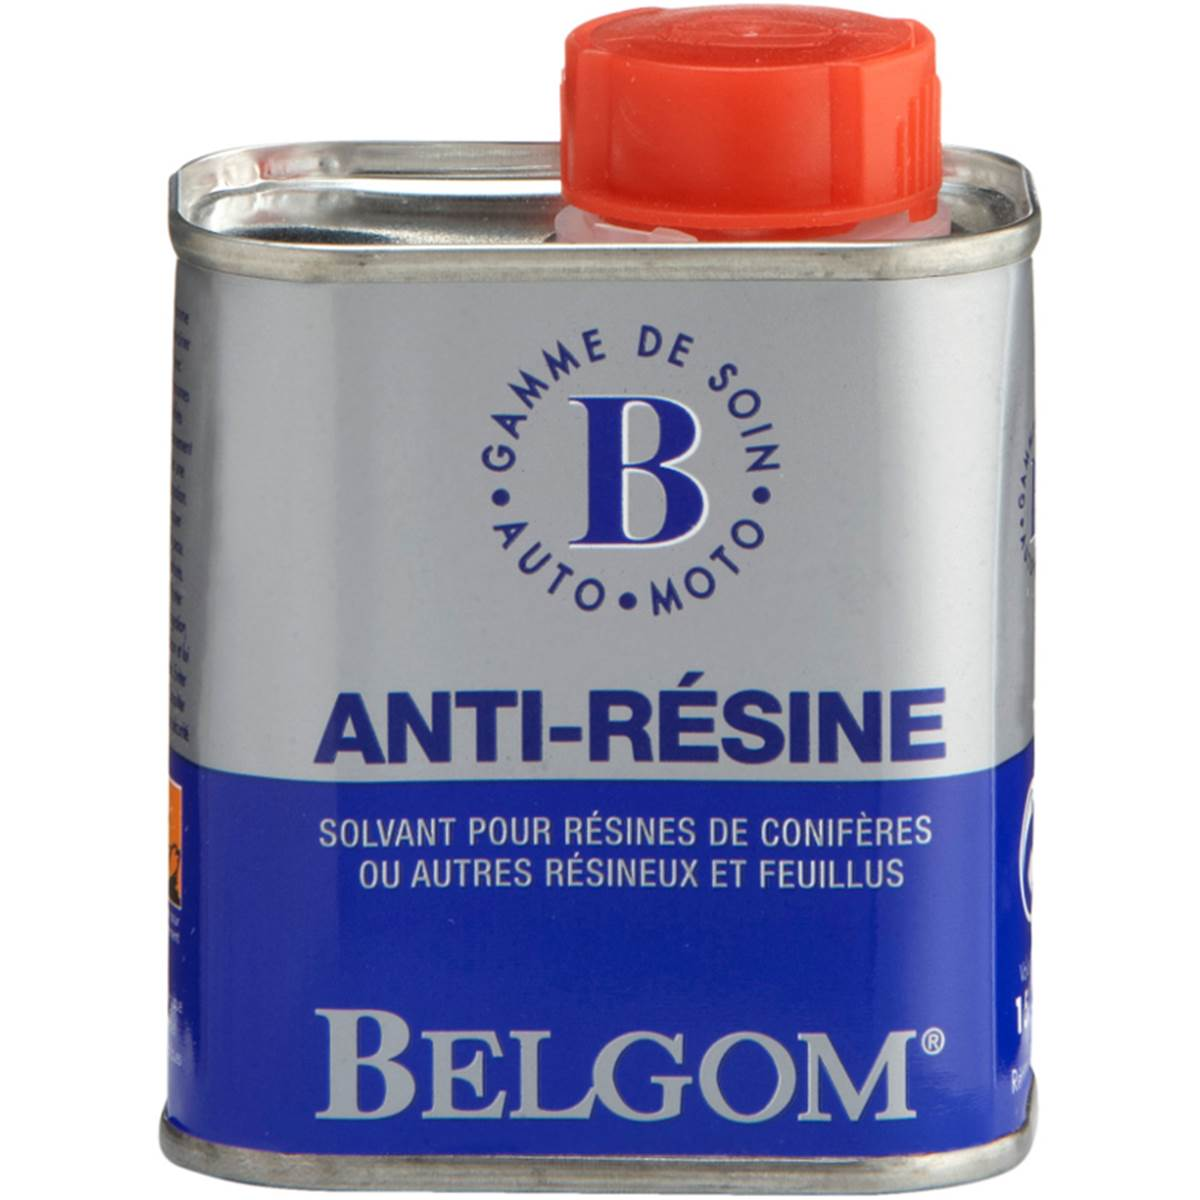 Nettoyant résine Belgom 150 ml